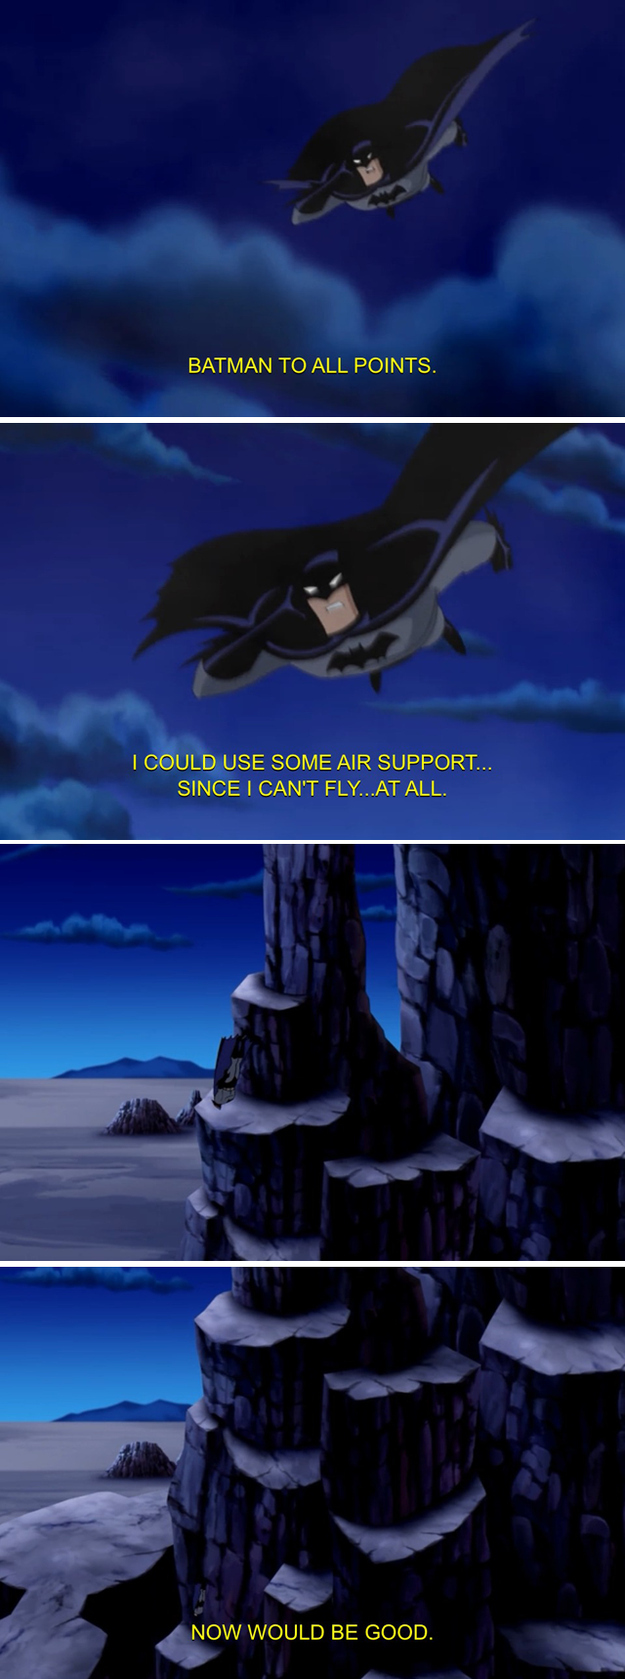 batman cannot fly.jpg